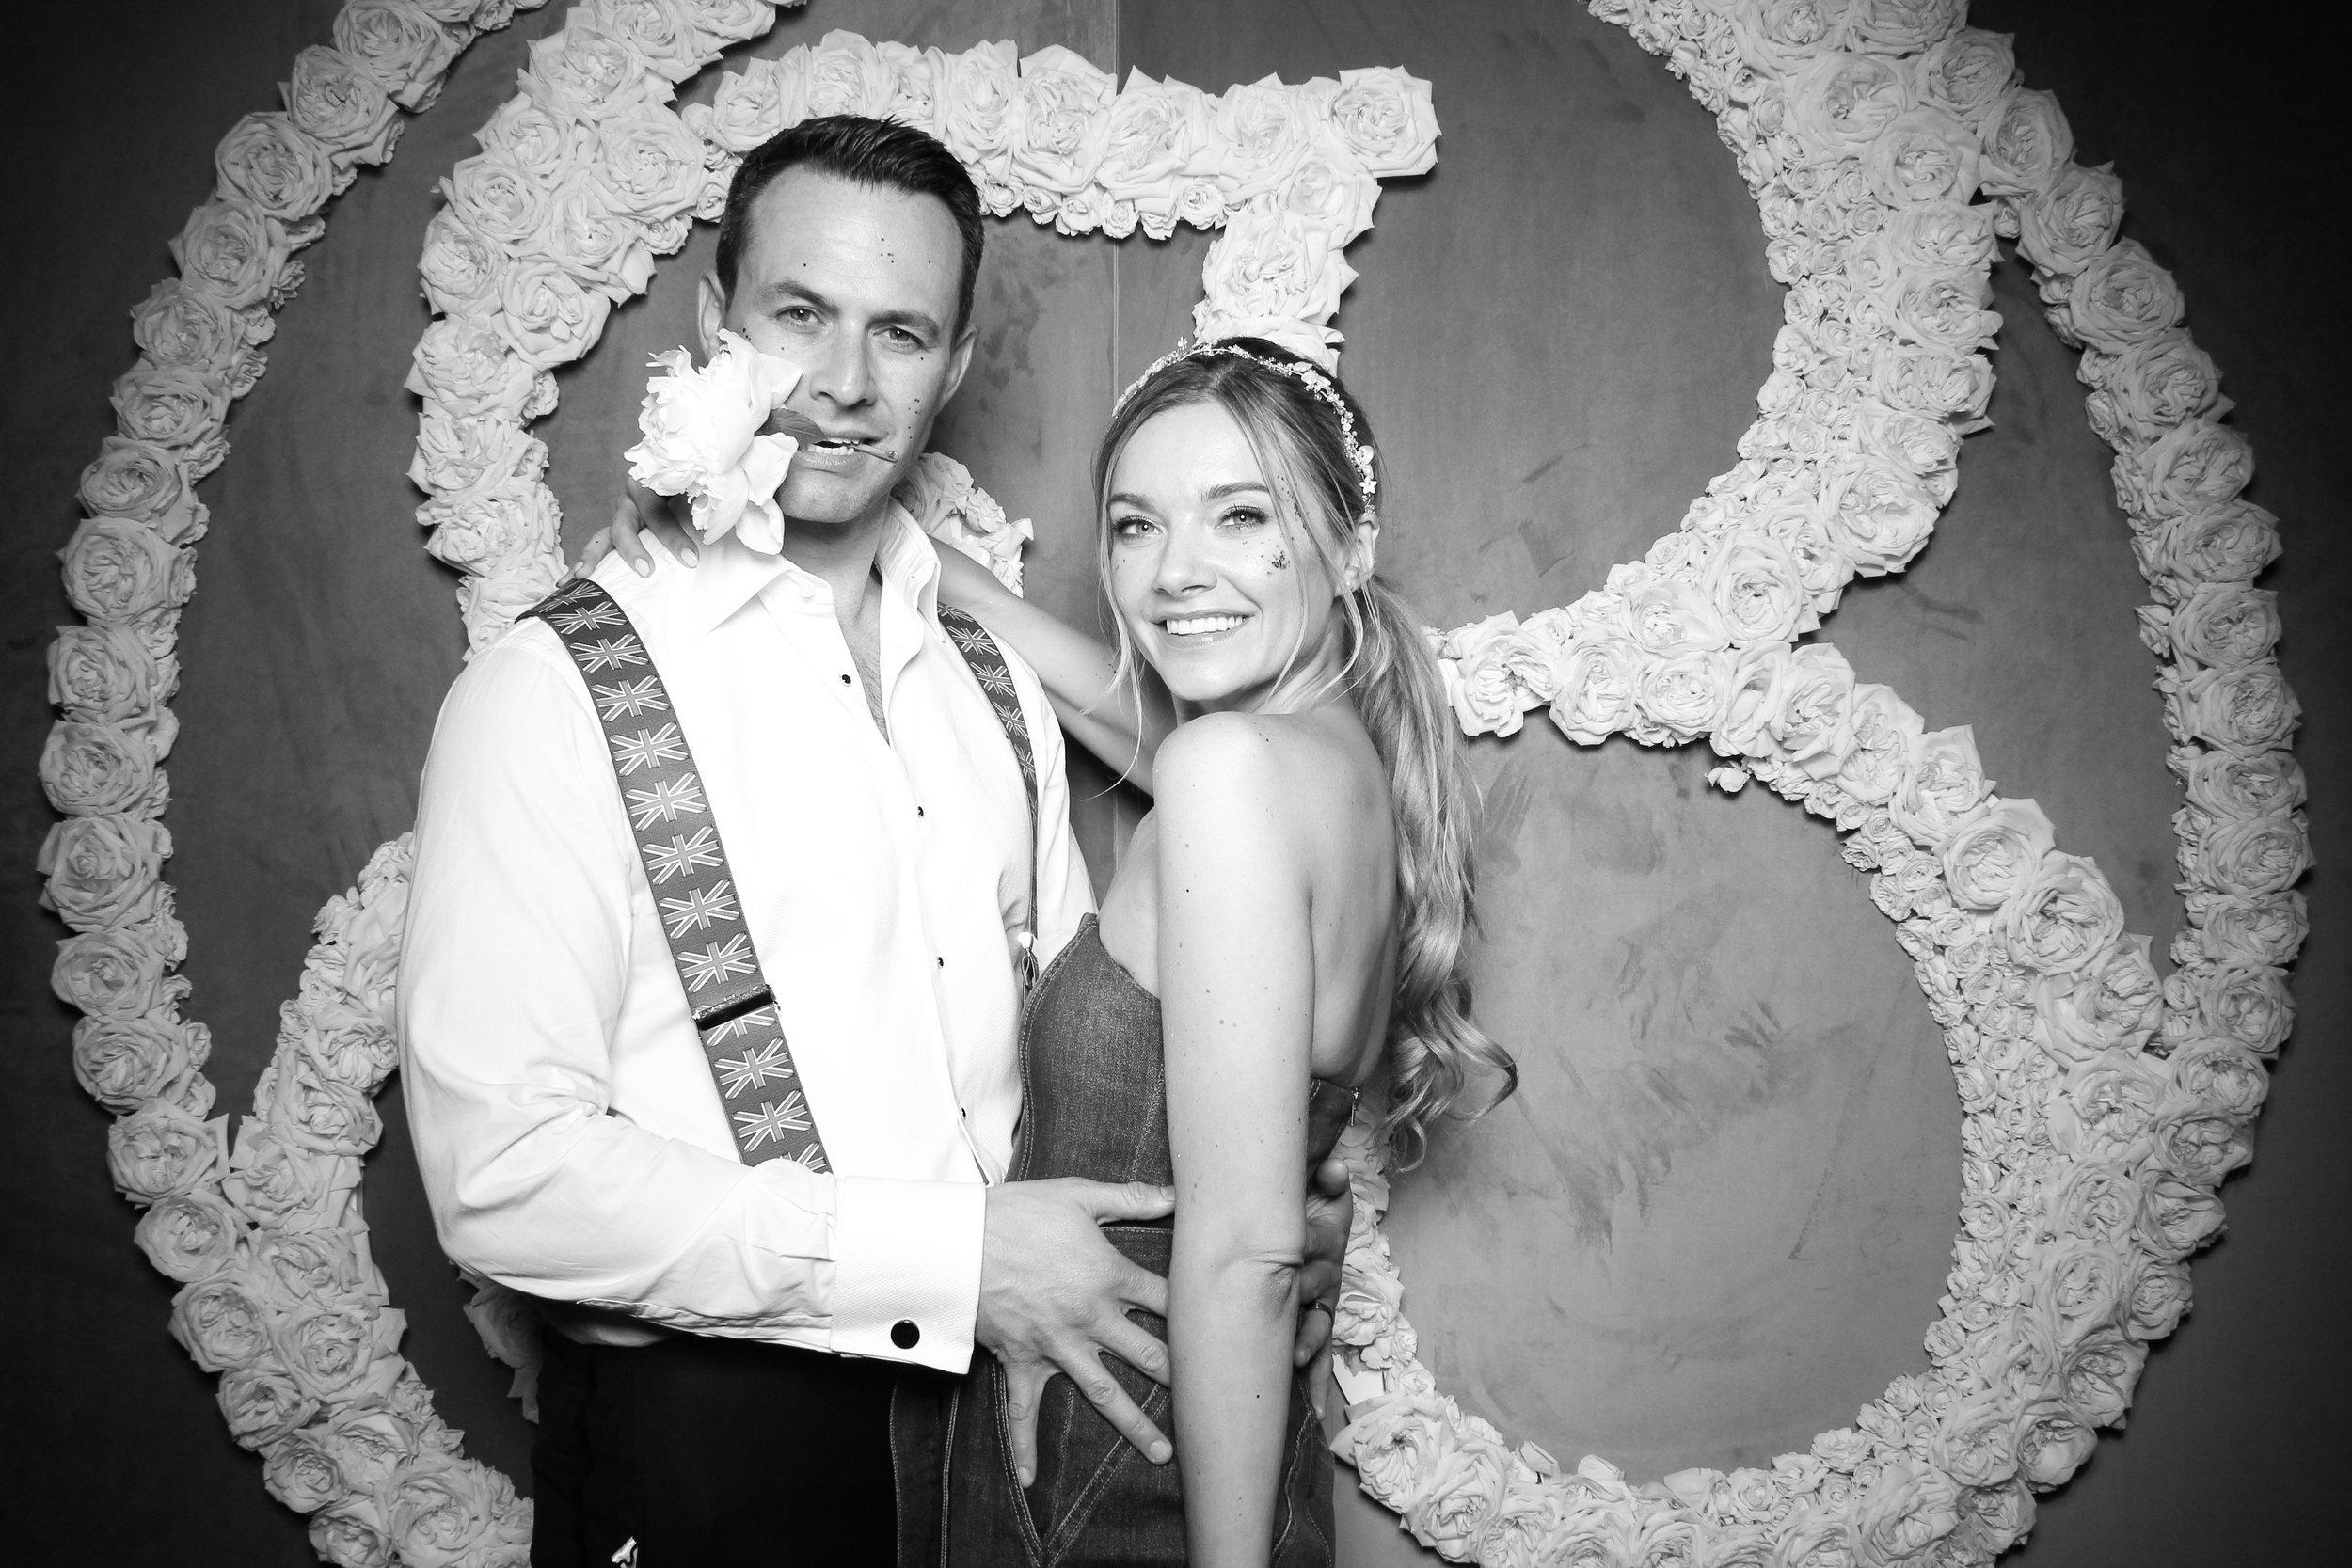 Photo_Booth_Rental_At_Standard_Club_Wedding_Chicago_15.jpg